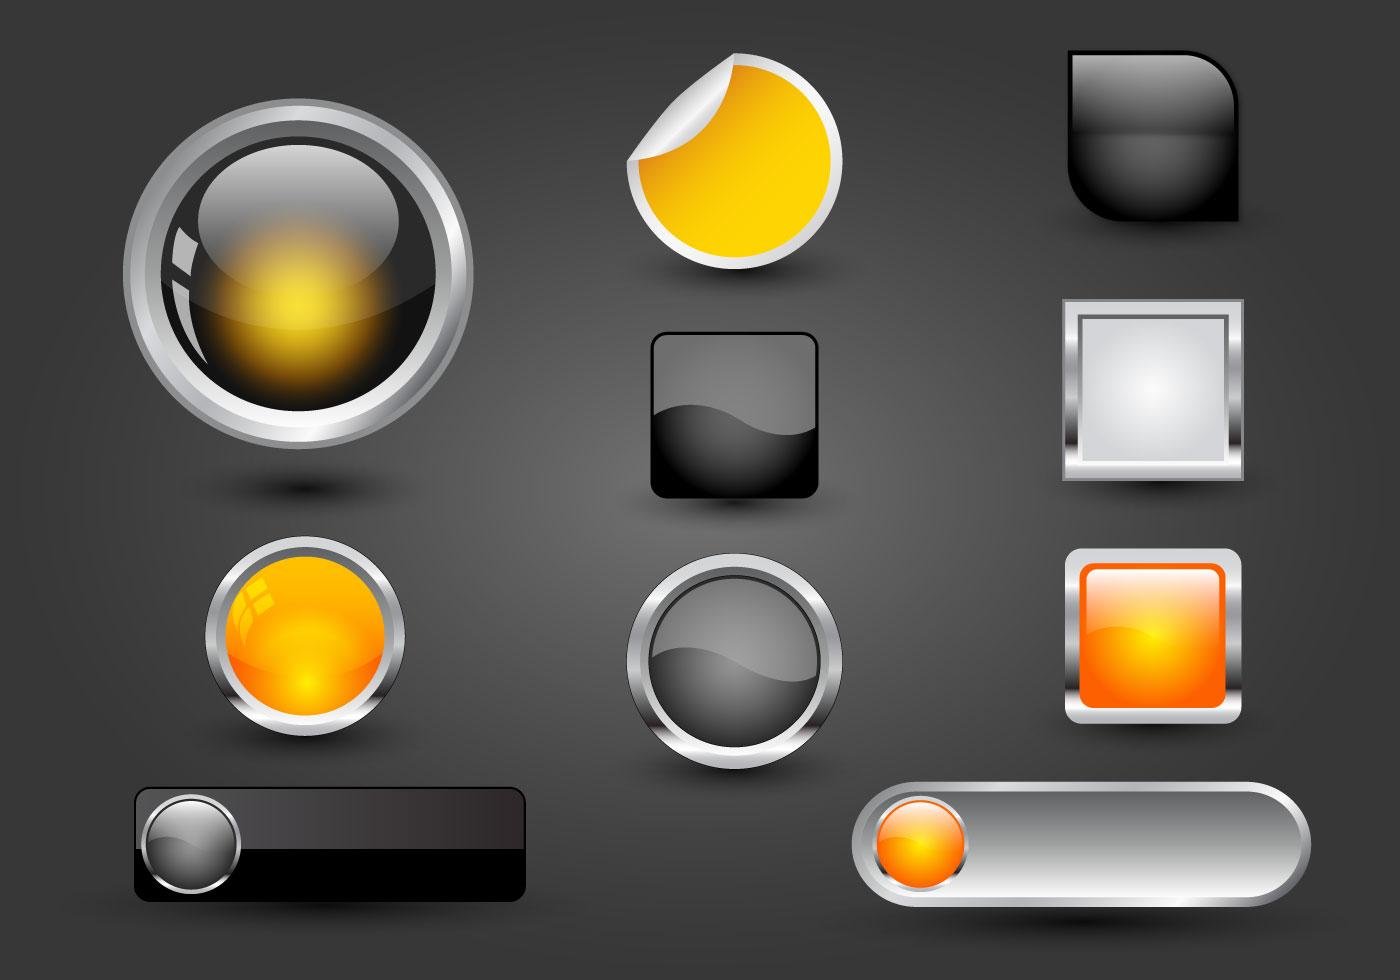 Объемные кнопки картинки